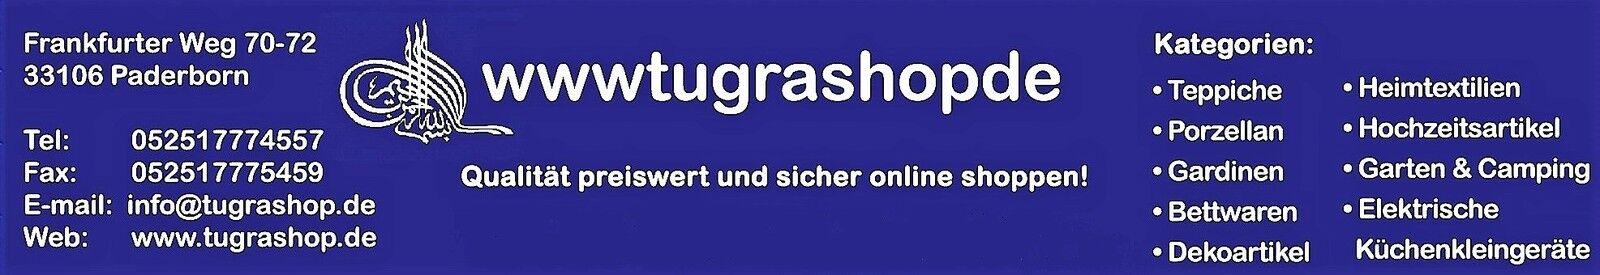 Tugra Shop